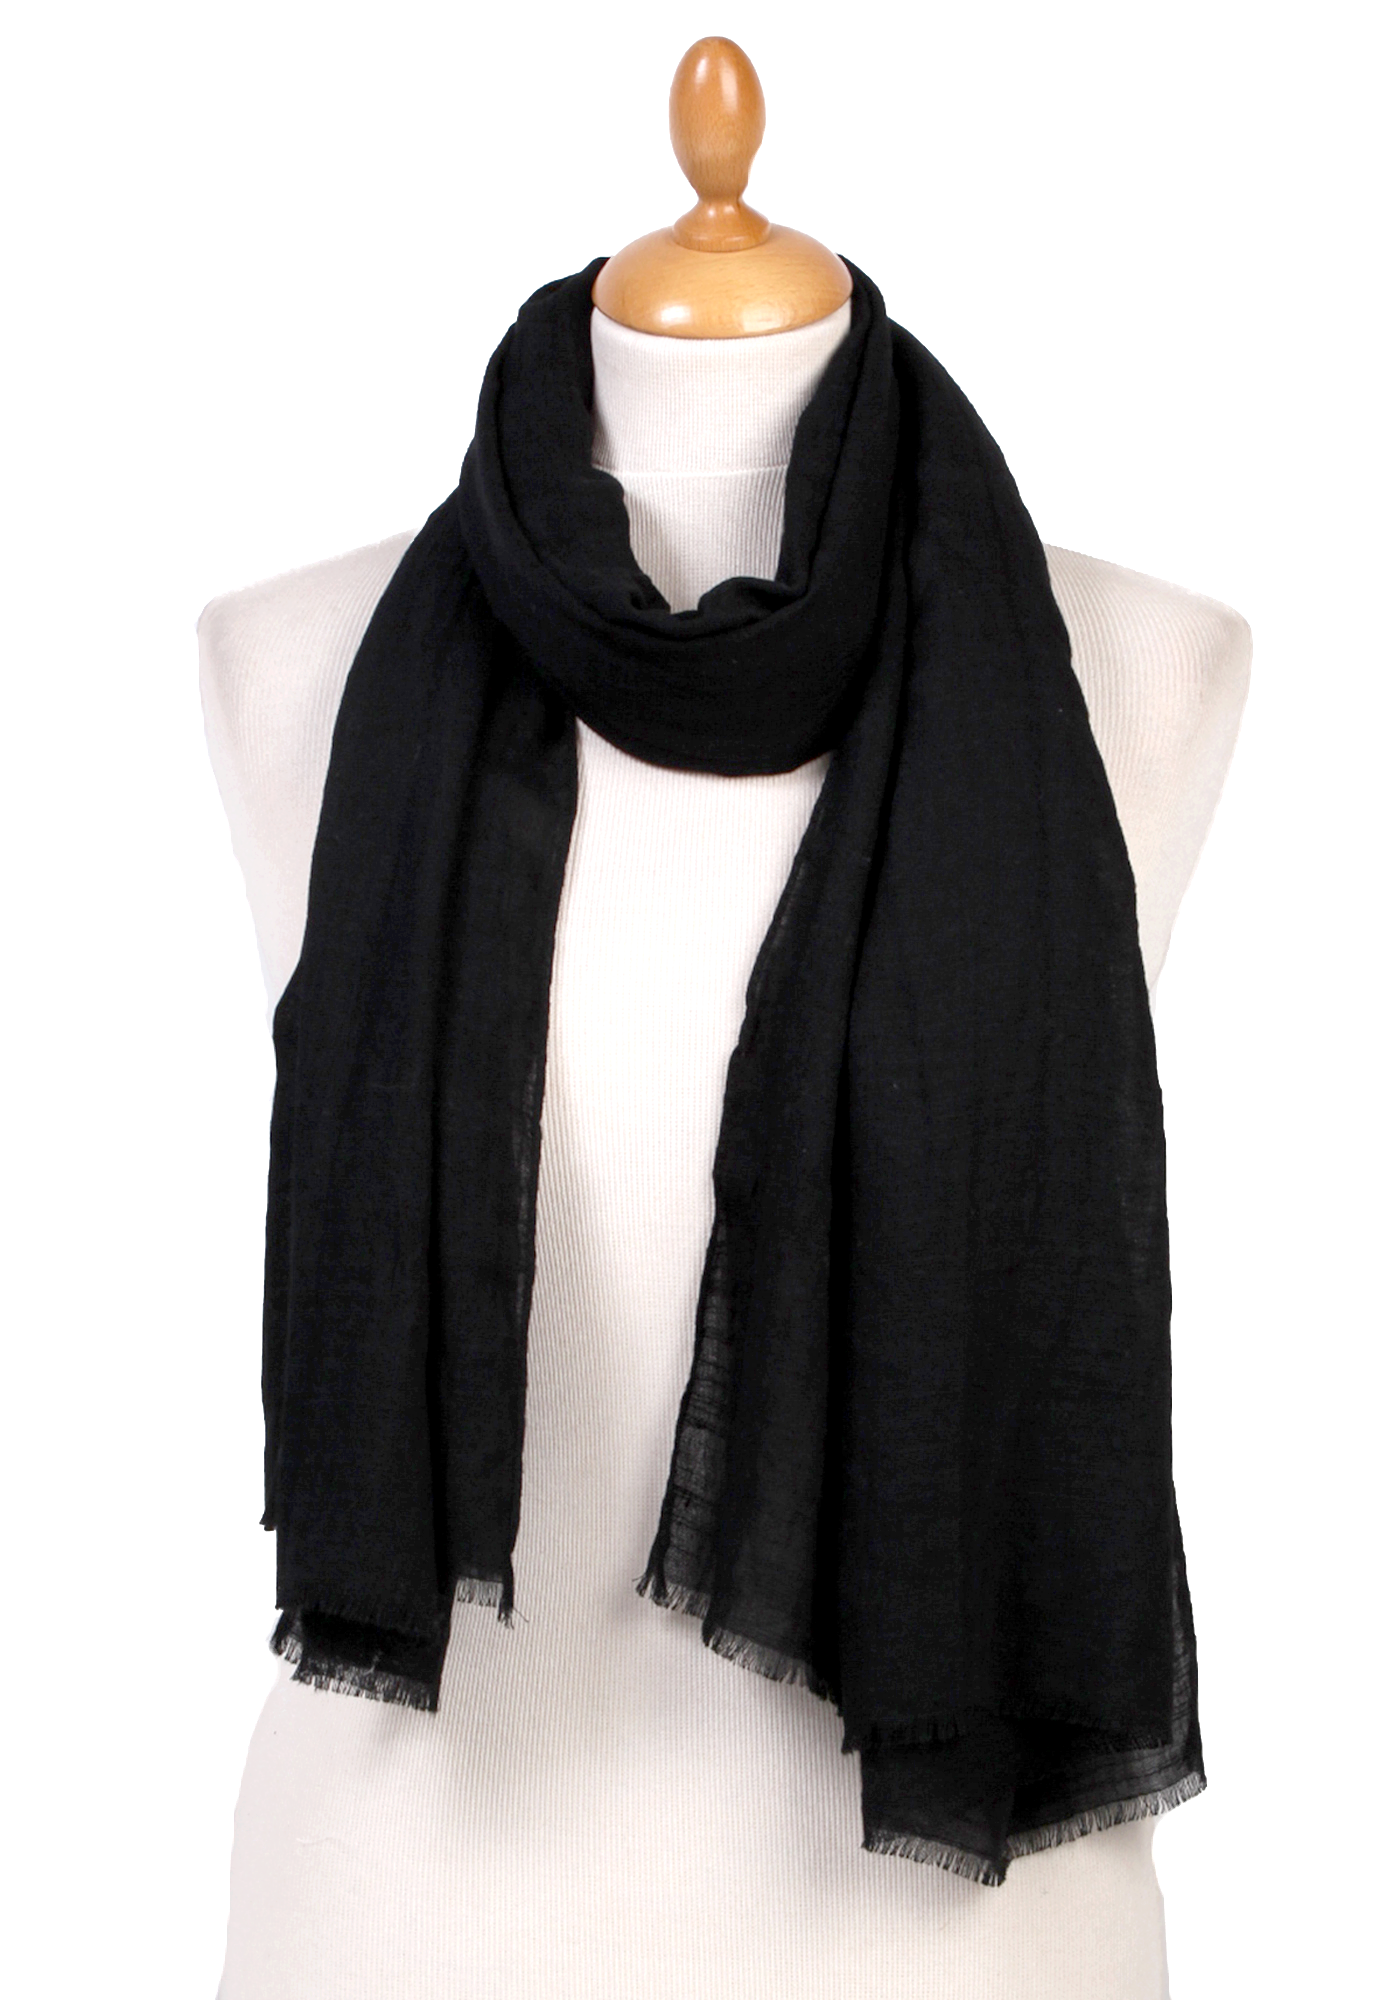 Foulard chèche noir lin coton premium